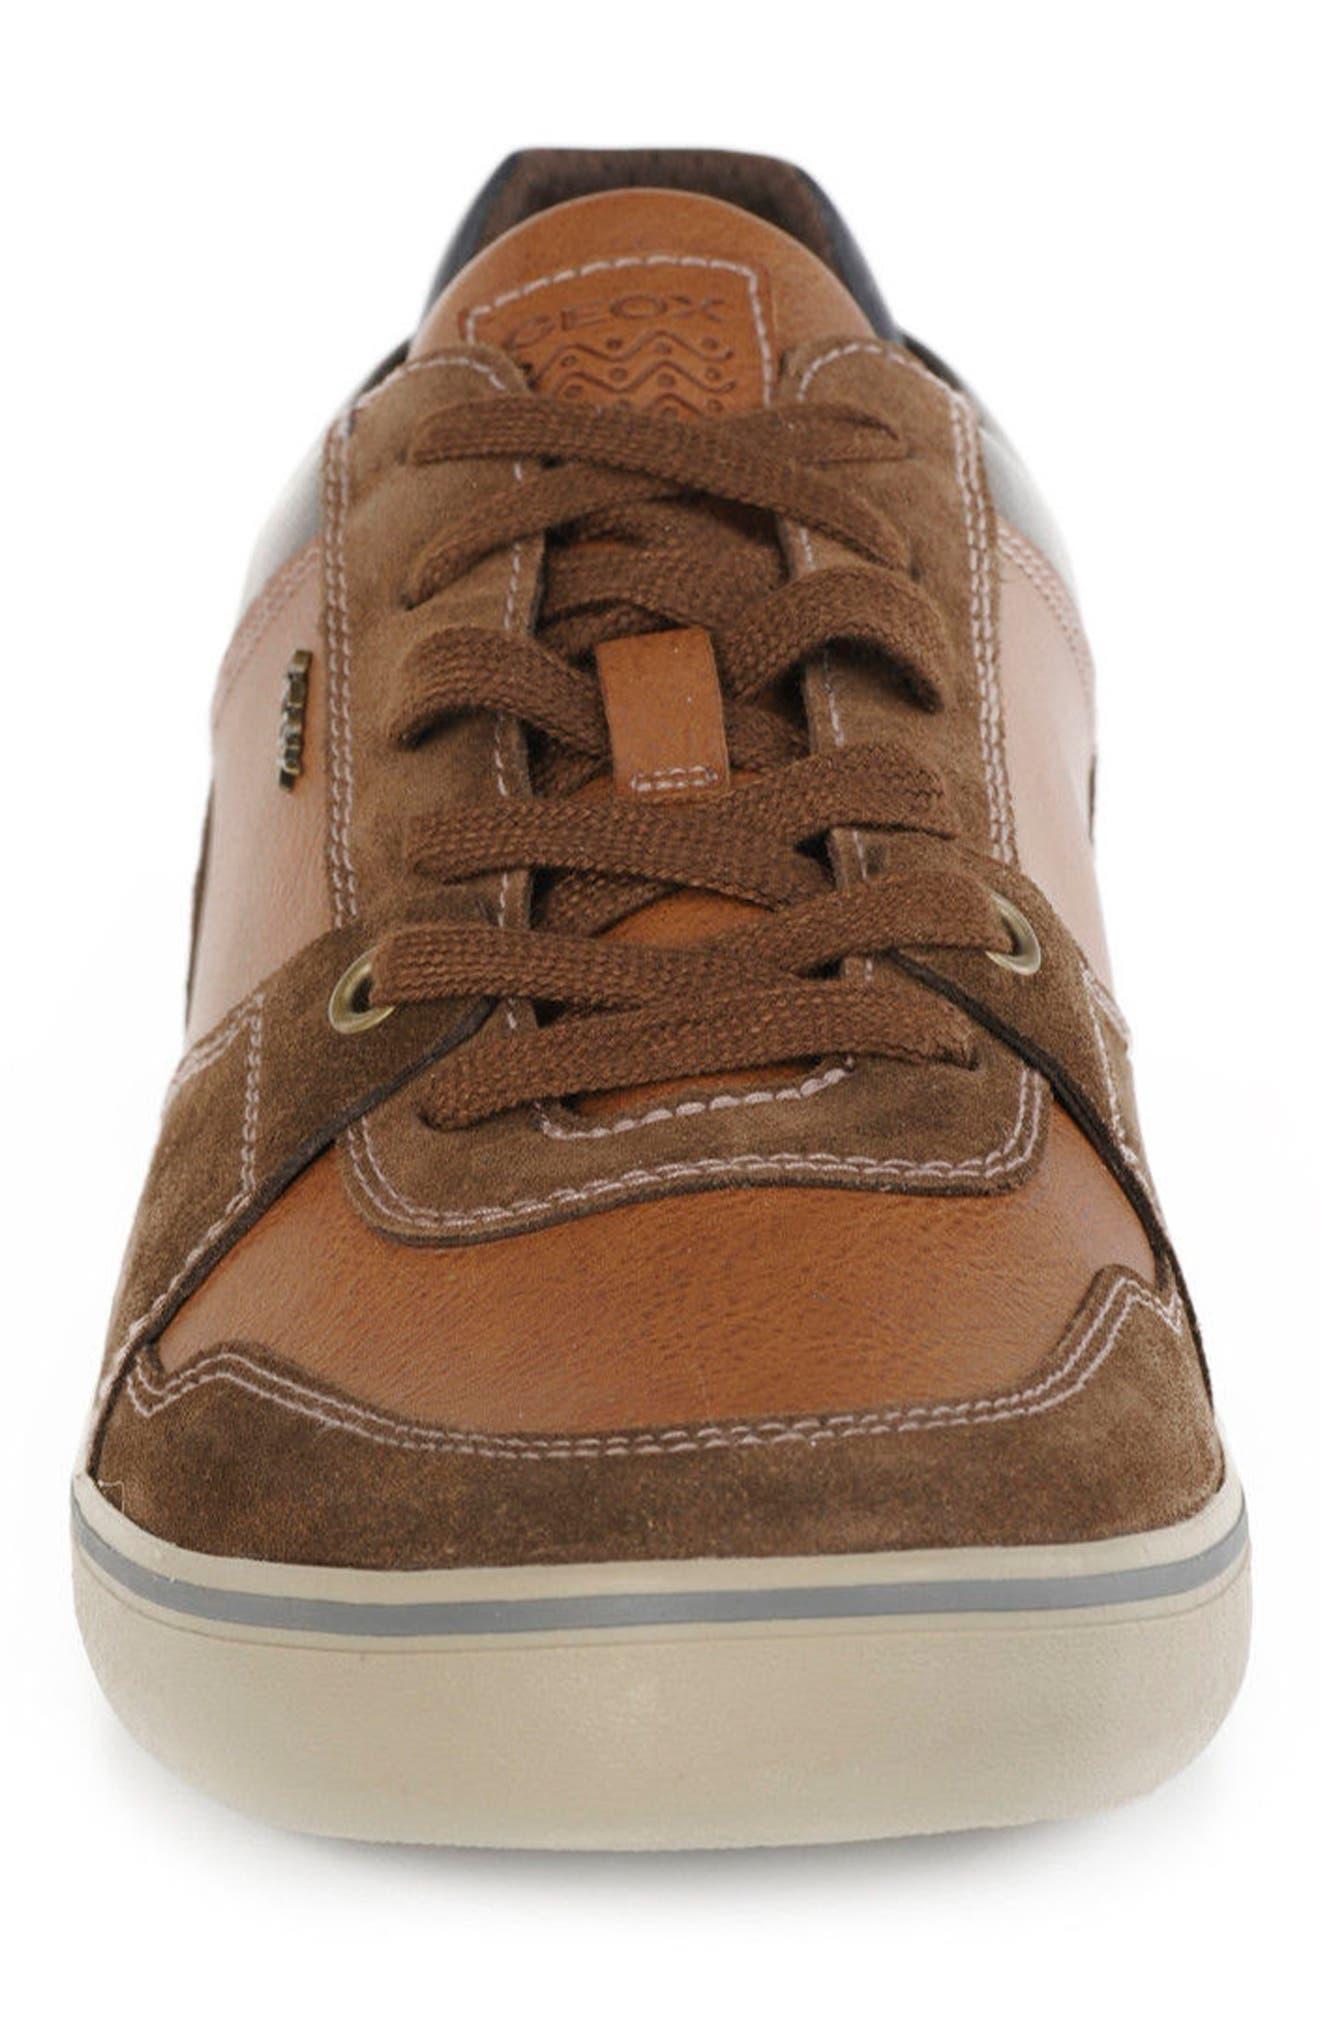 Box 27 Low-Top Sneaker,                             Alternate thumbnail 4, color,                             Ebony/ Brown Cotto